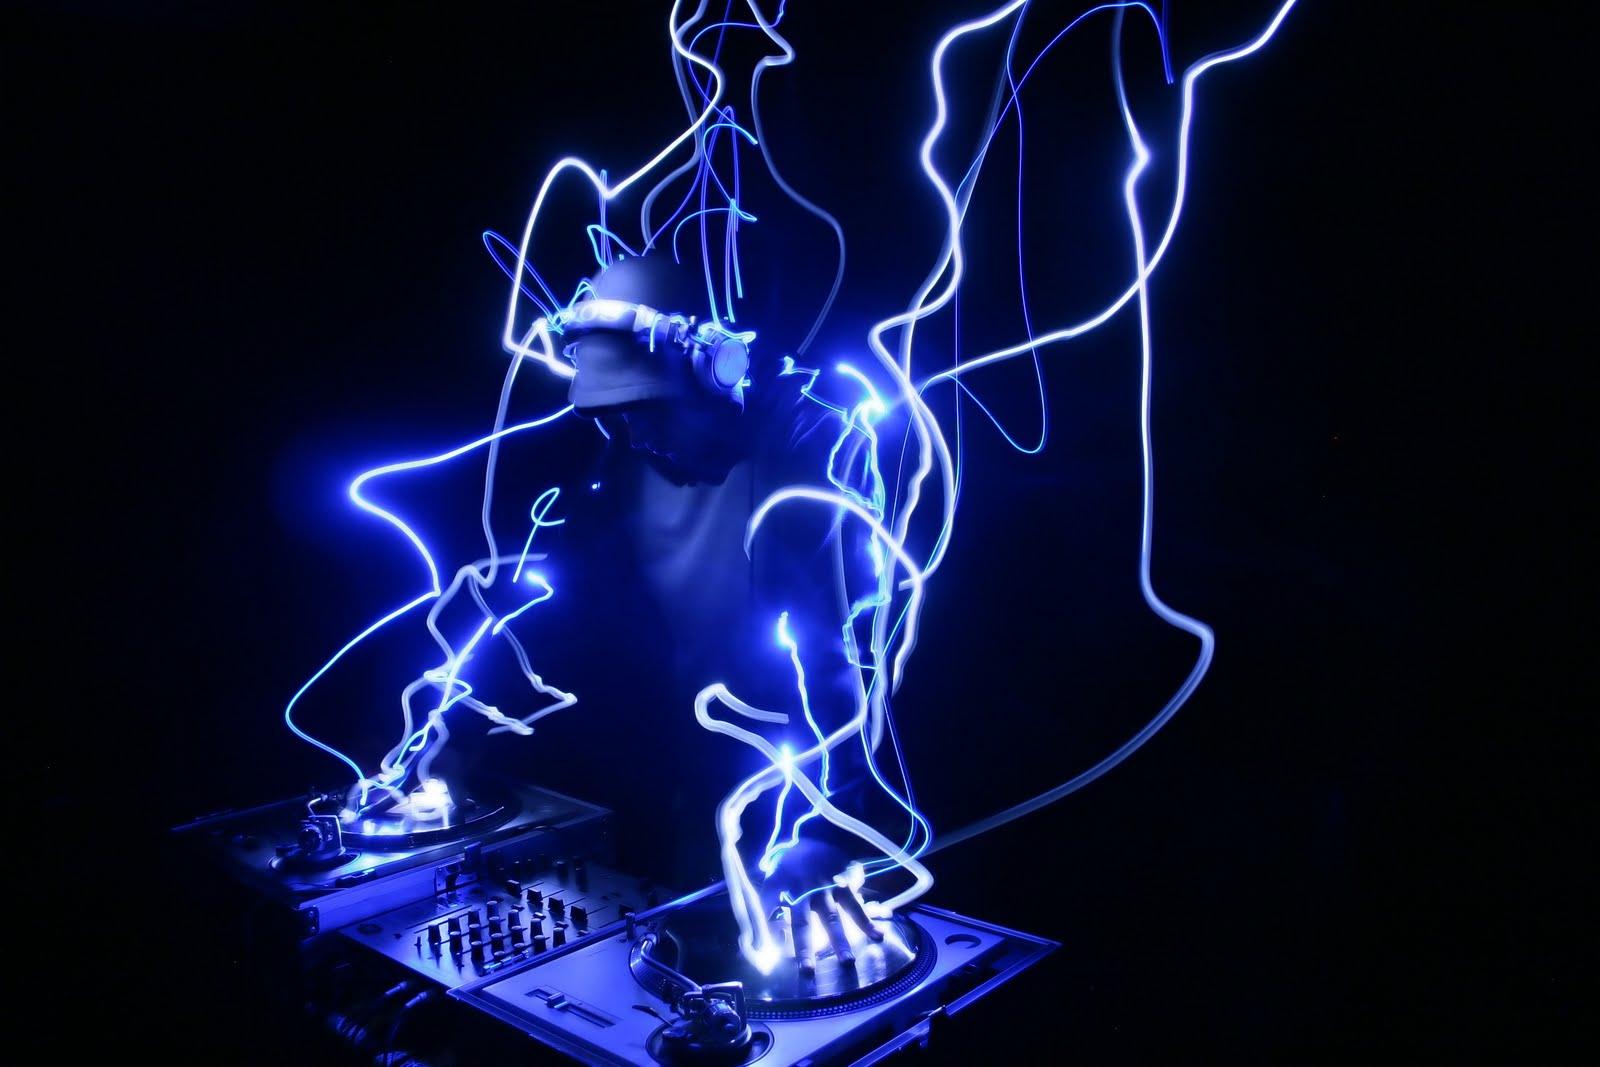 Electro Techno Music